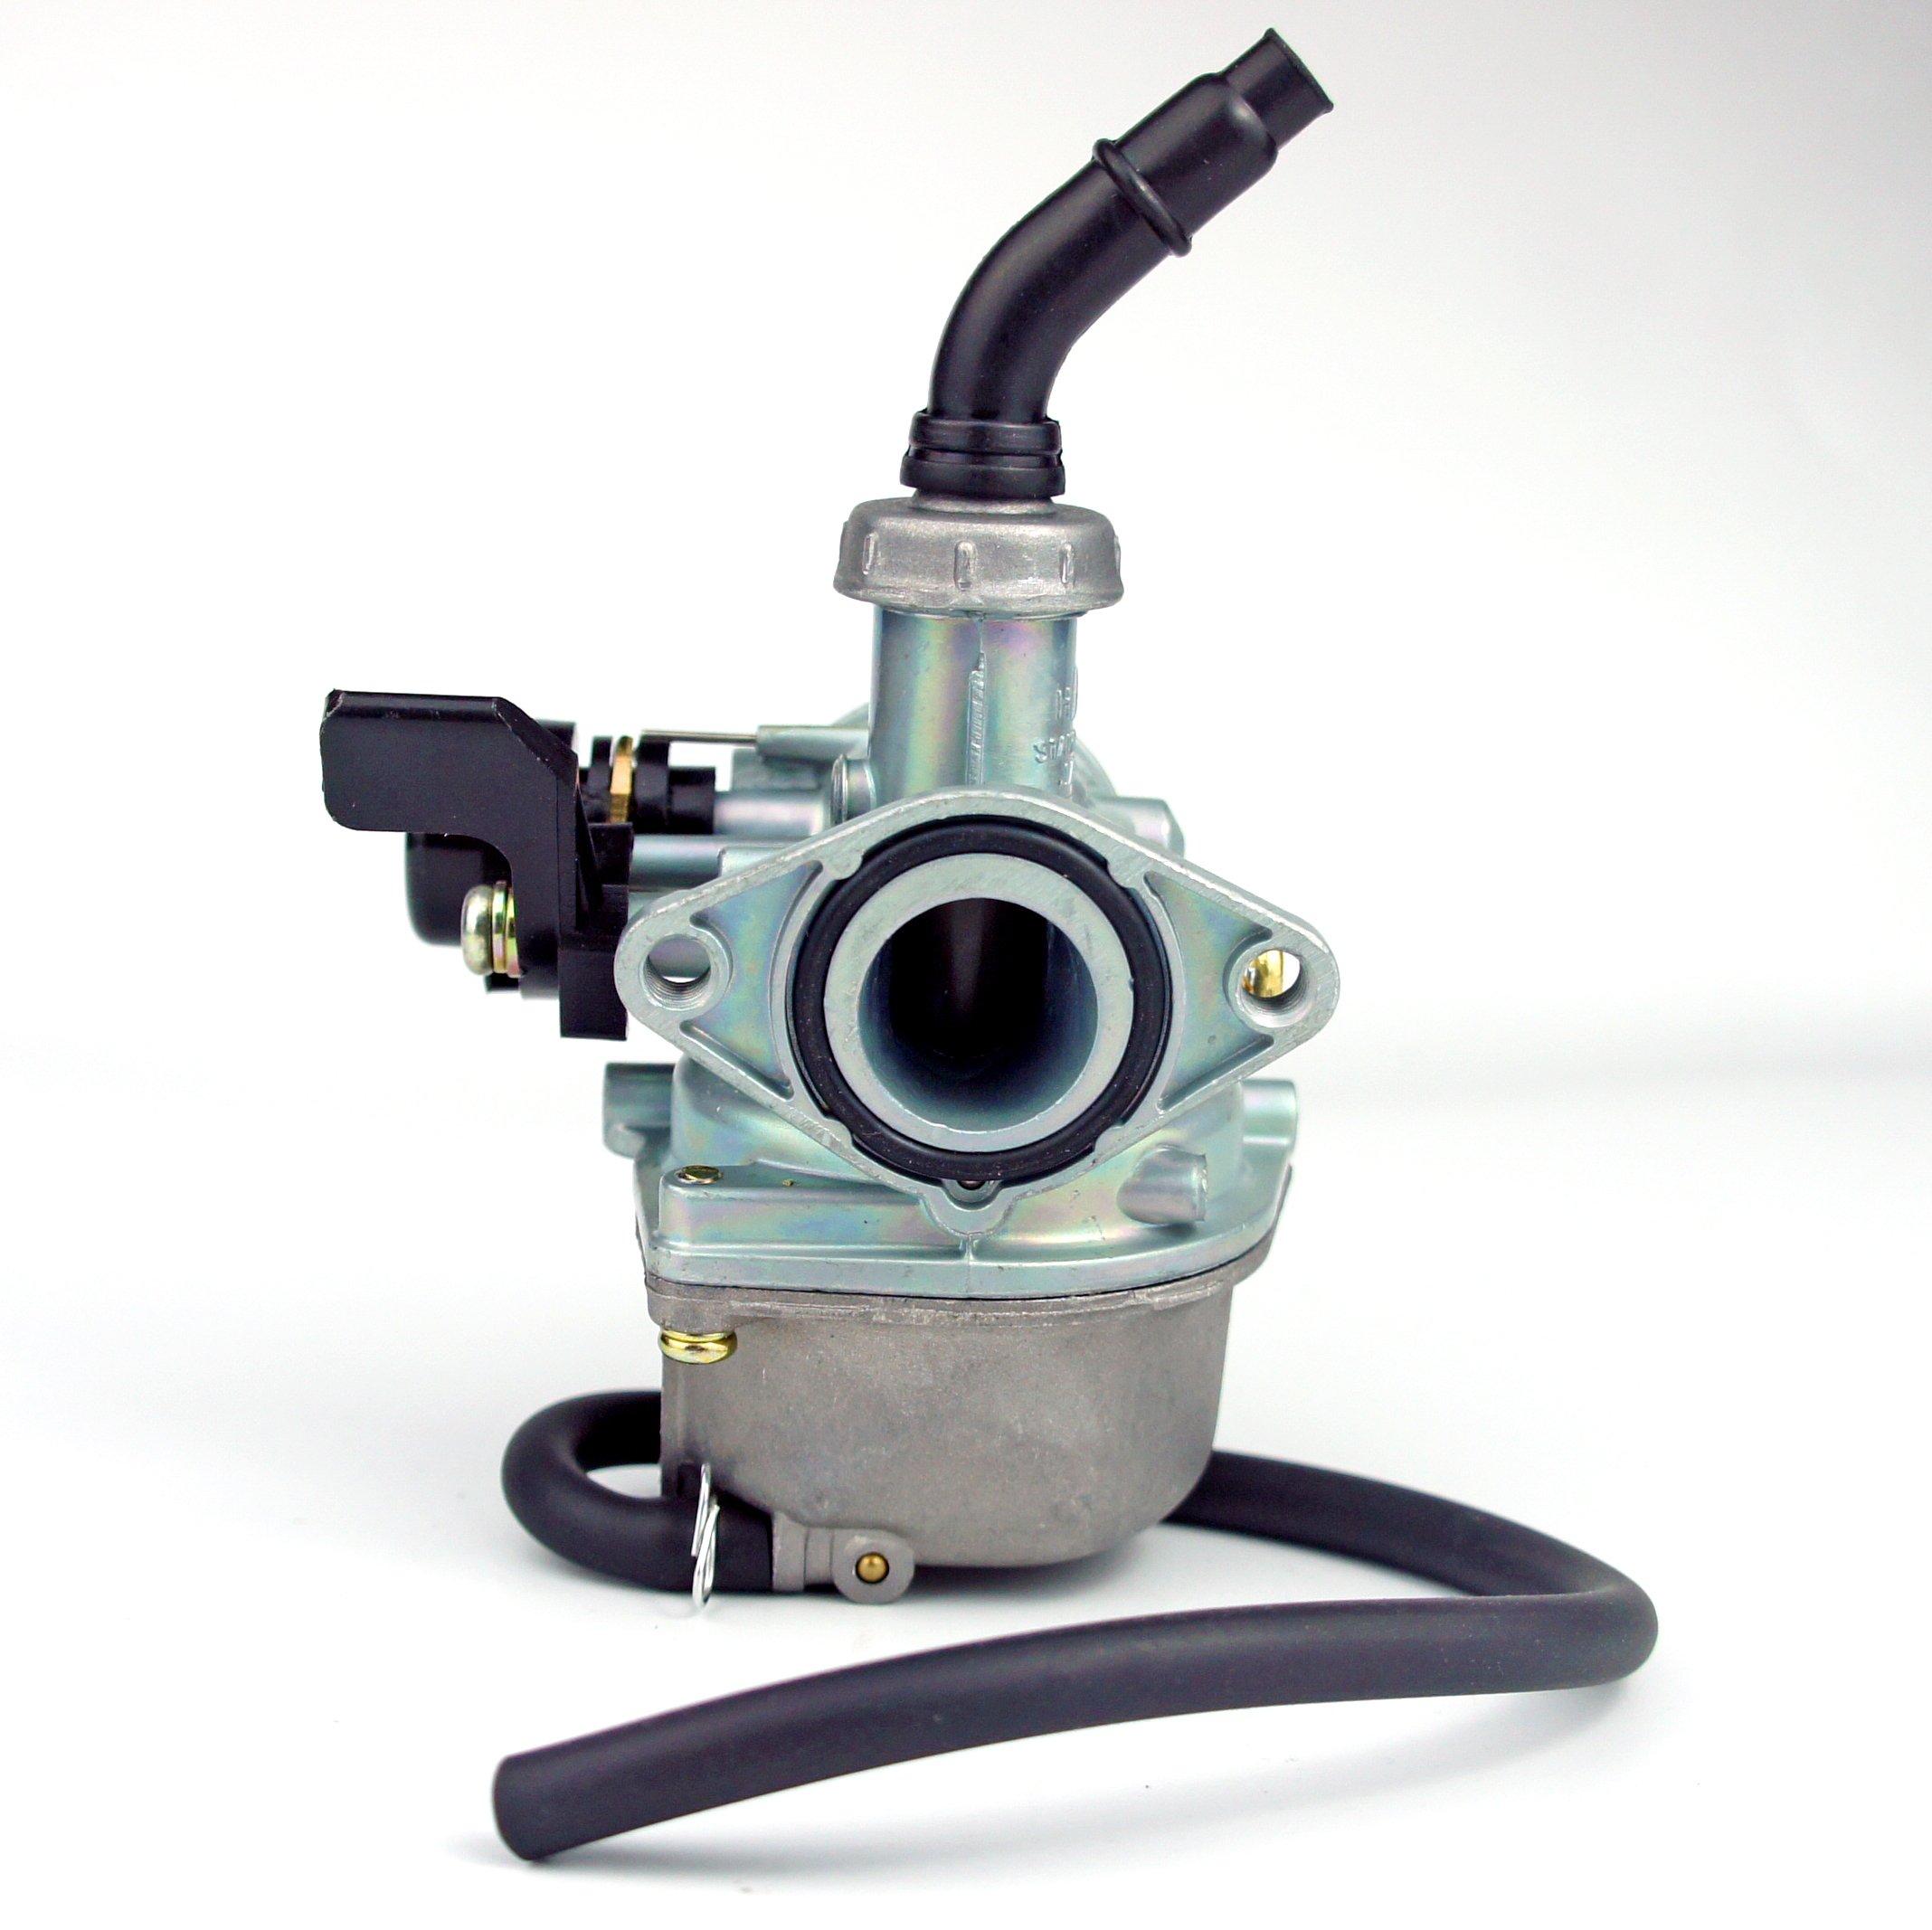 Cable Choke Carburetor PZ19 With CHOKE LEVER For 50cc 70cc 90cc 110cc 125cc kids' ATV, GO-KART, DIRT BIKE, POCKET BIKE 19mm Carb ( Hand Choke Lever)